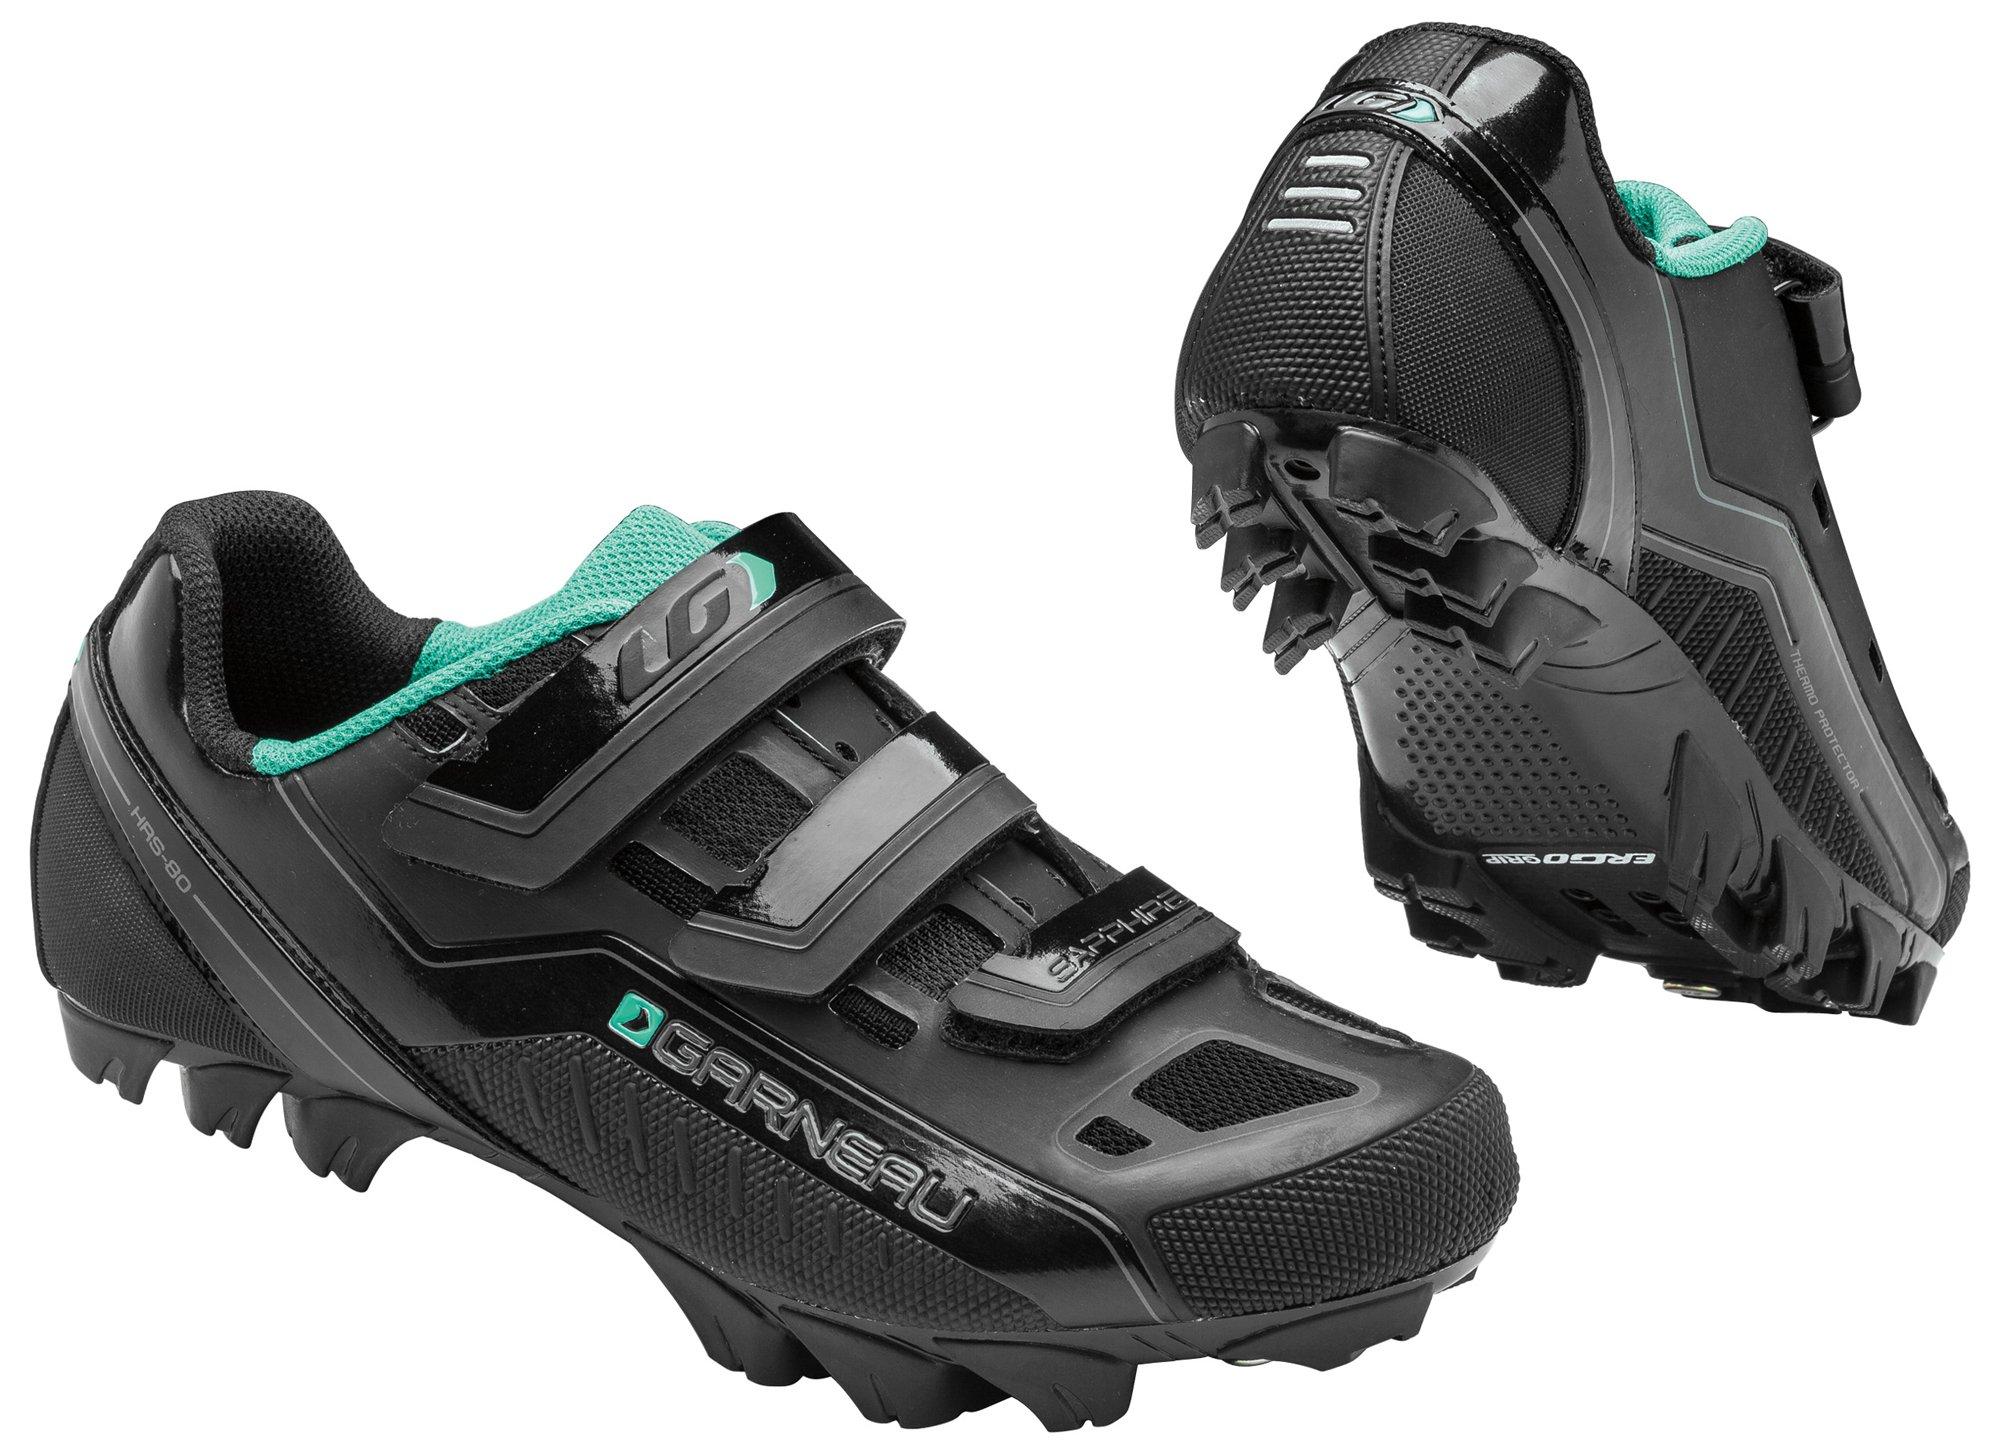 Louis Garneau - Women's Sapphire Mountain Bike Shoes, Black, 37